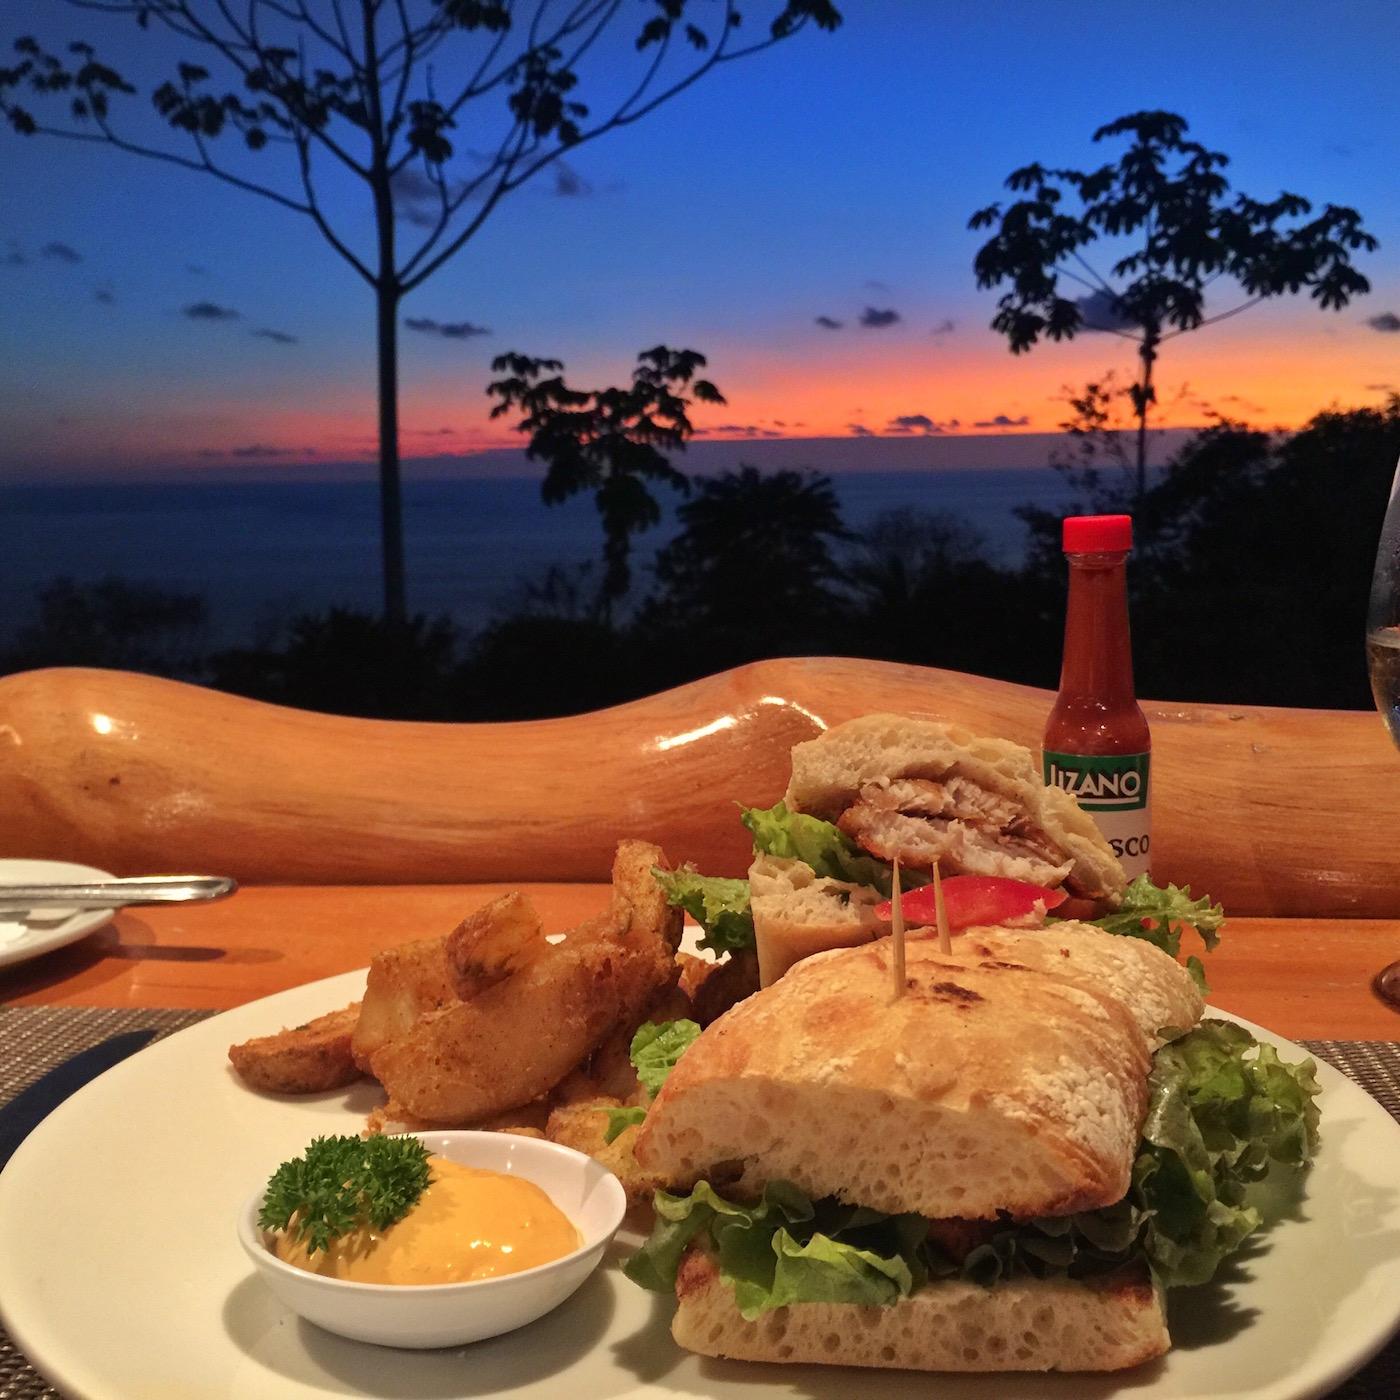 Dinner at La Cusinga Restaurant Aracari